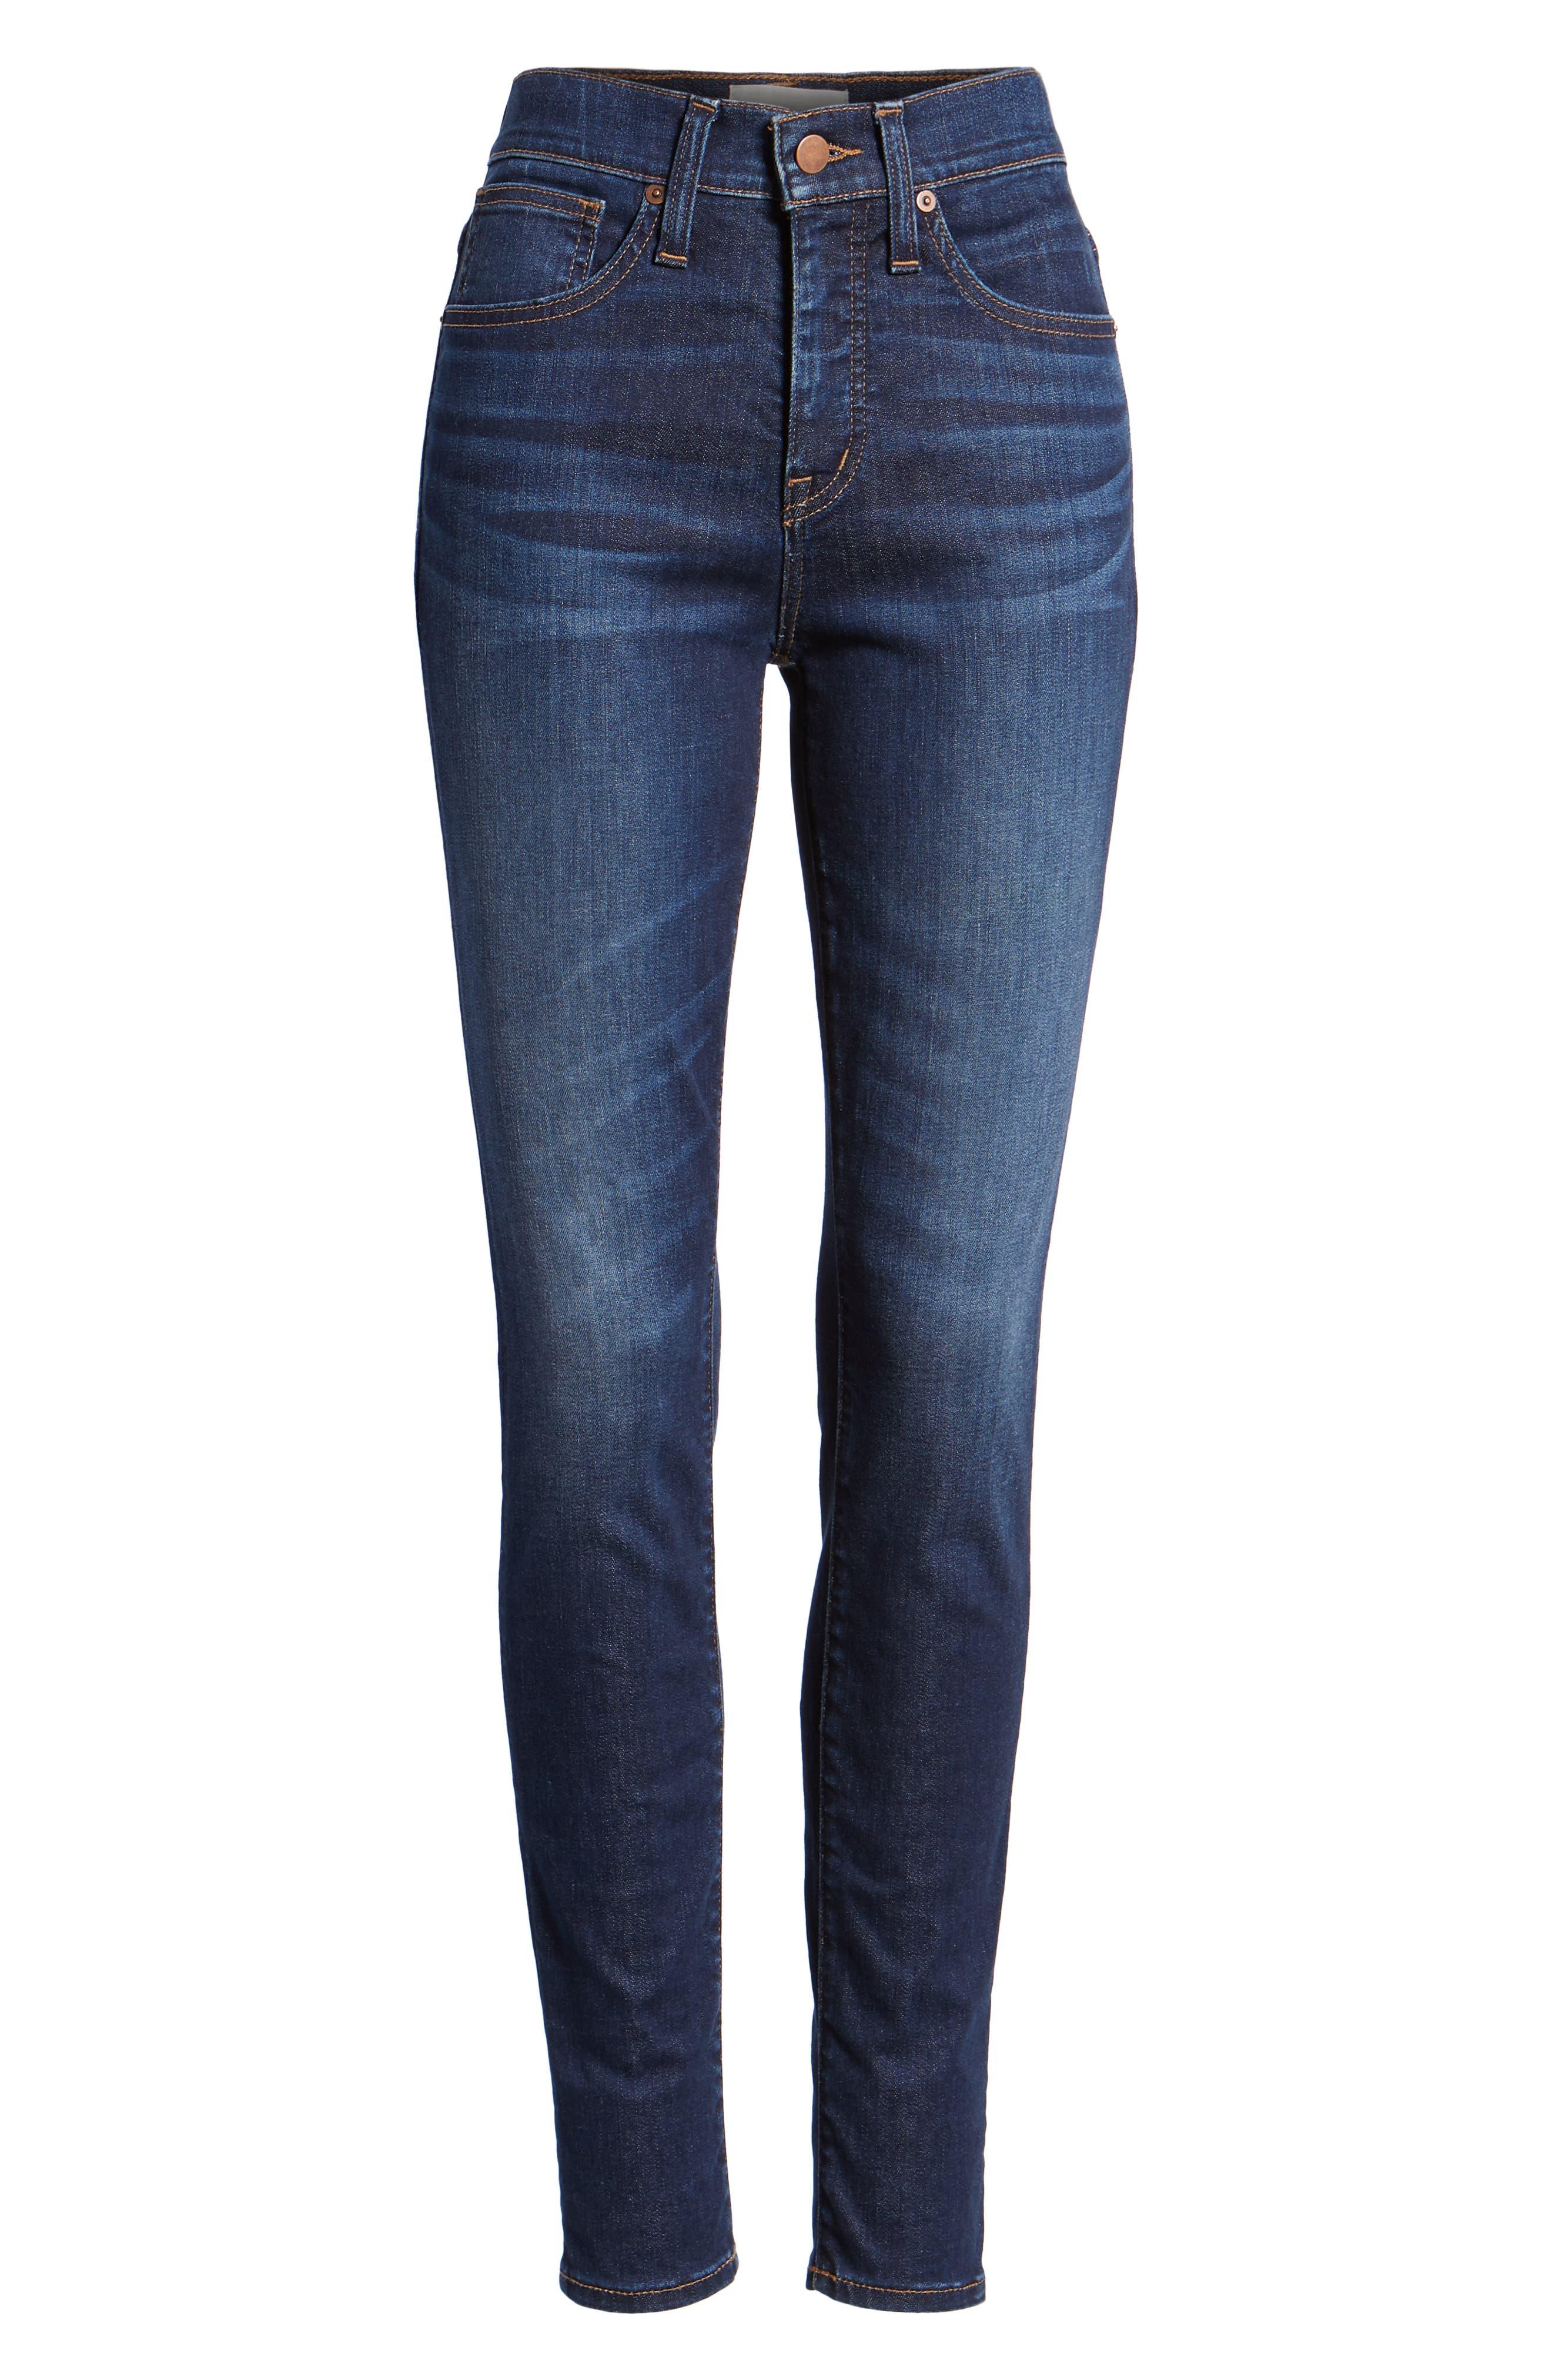 Skinny Jeans,                             Alternate thumbnail 7, color,                             DARK SOFT